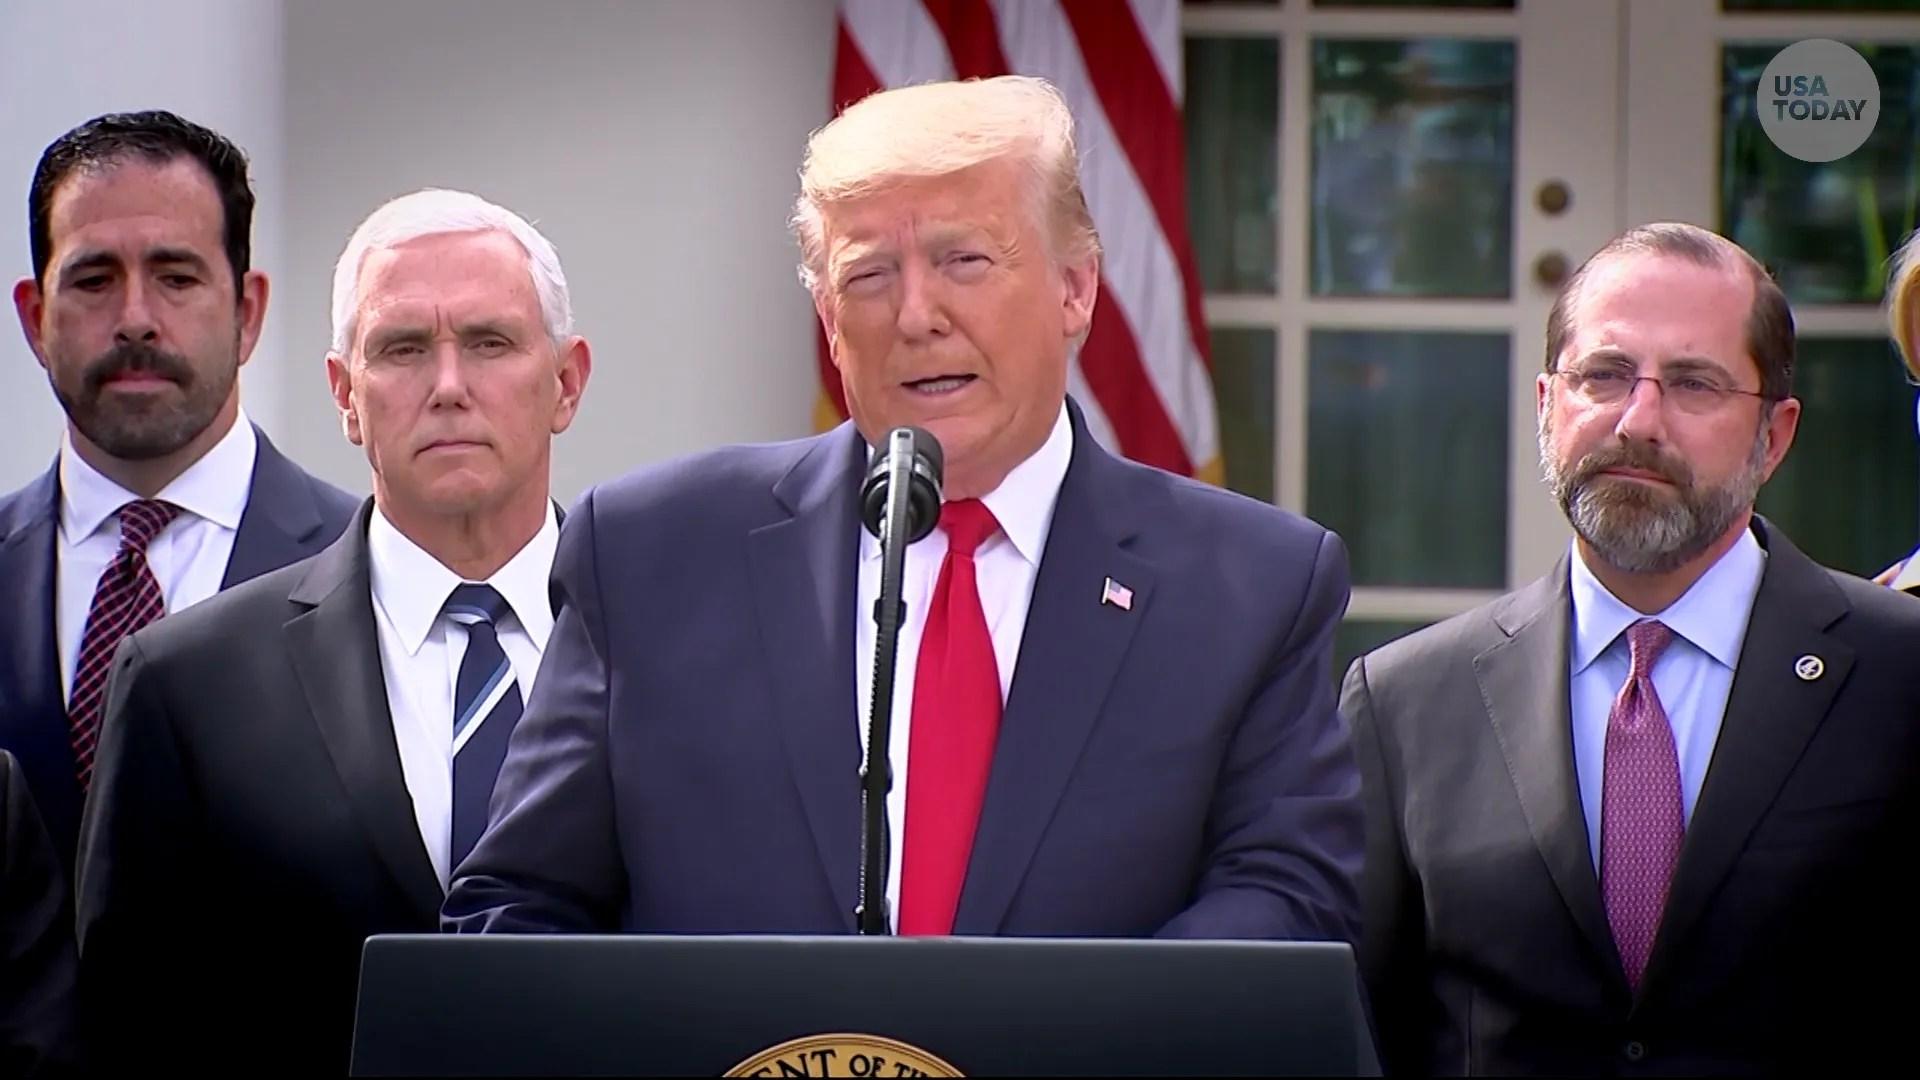 Coronavirus: Trump backs economic relief deal reached with Democrats